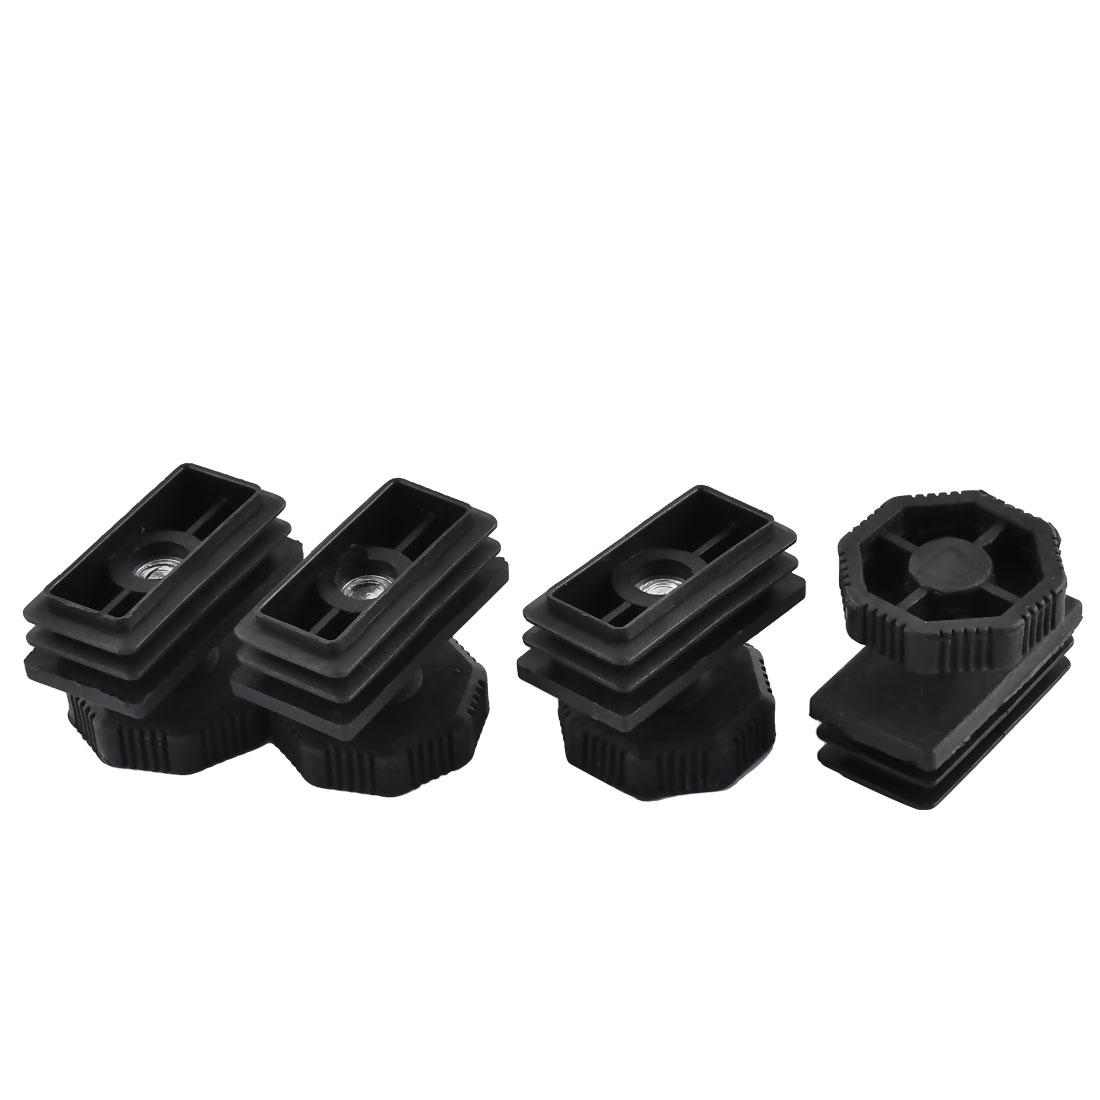 4 Sets Office Desk Adjustable Leveling Foot 49mm x 21mm Rectangle Shaped Tube Insert Kit